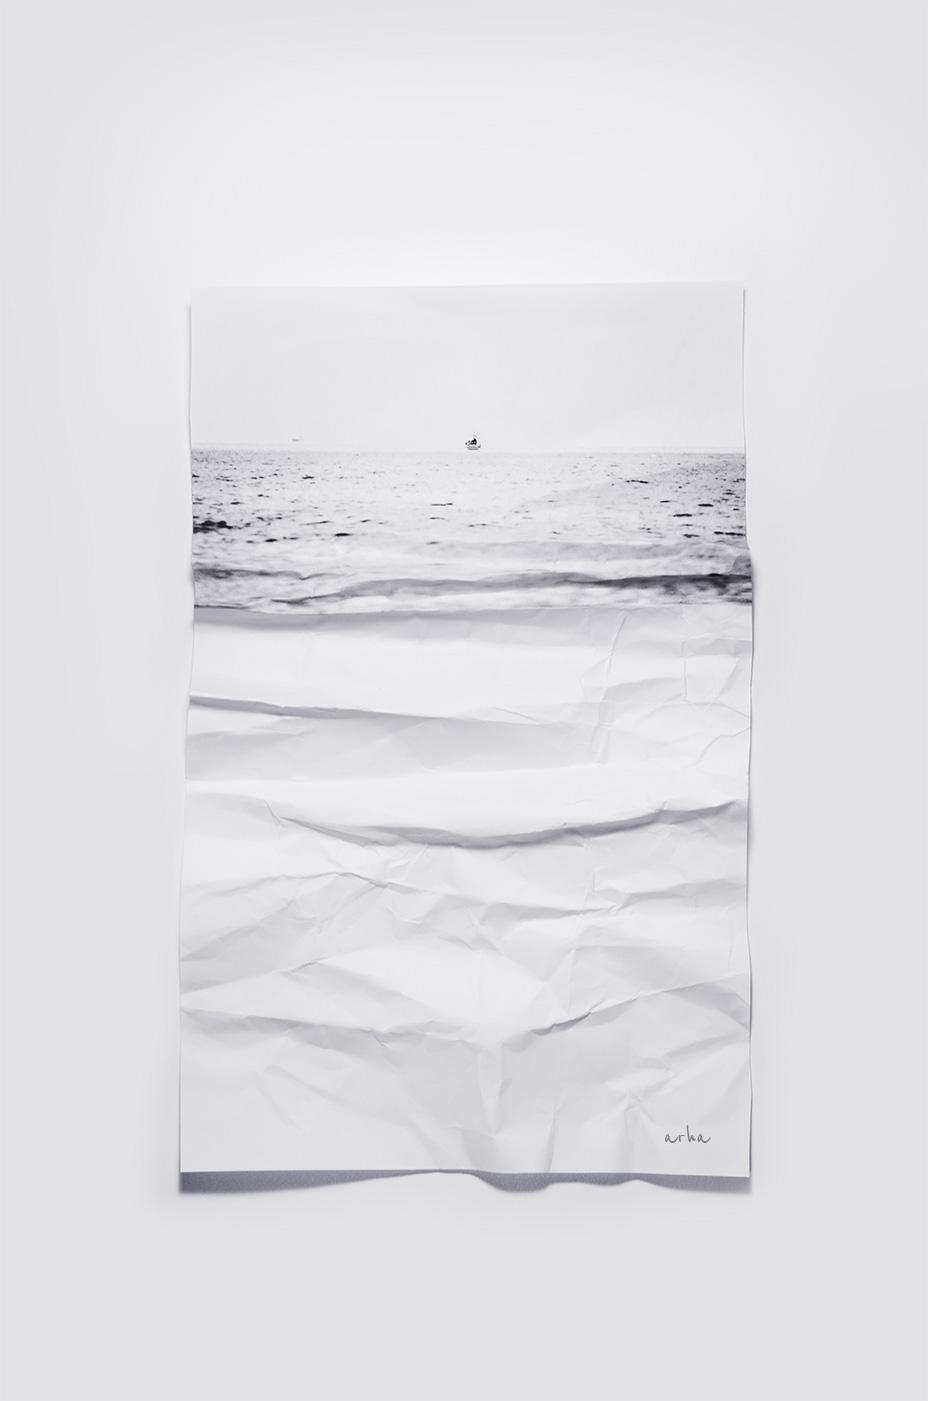 The-view-from-a-desk-copyright-2012-arha-Tomomichi-Morifuji